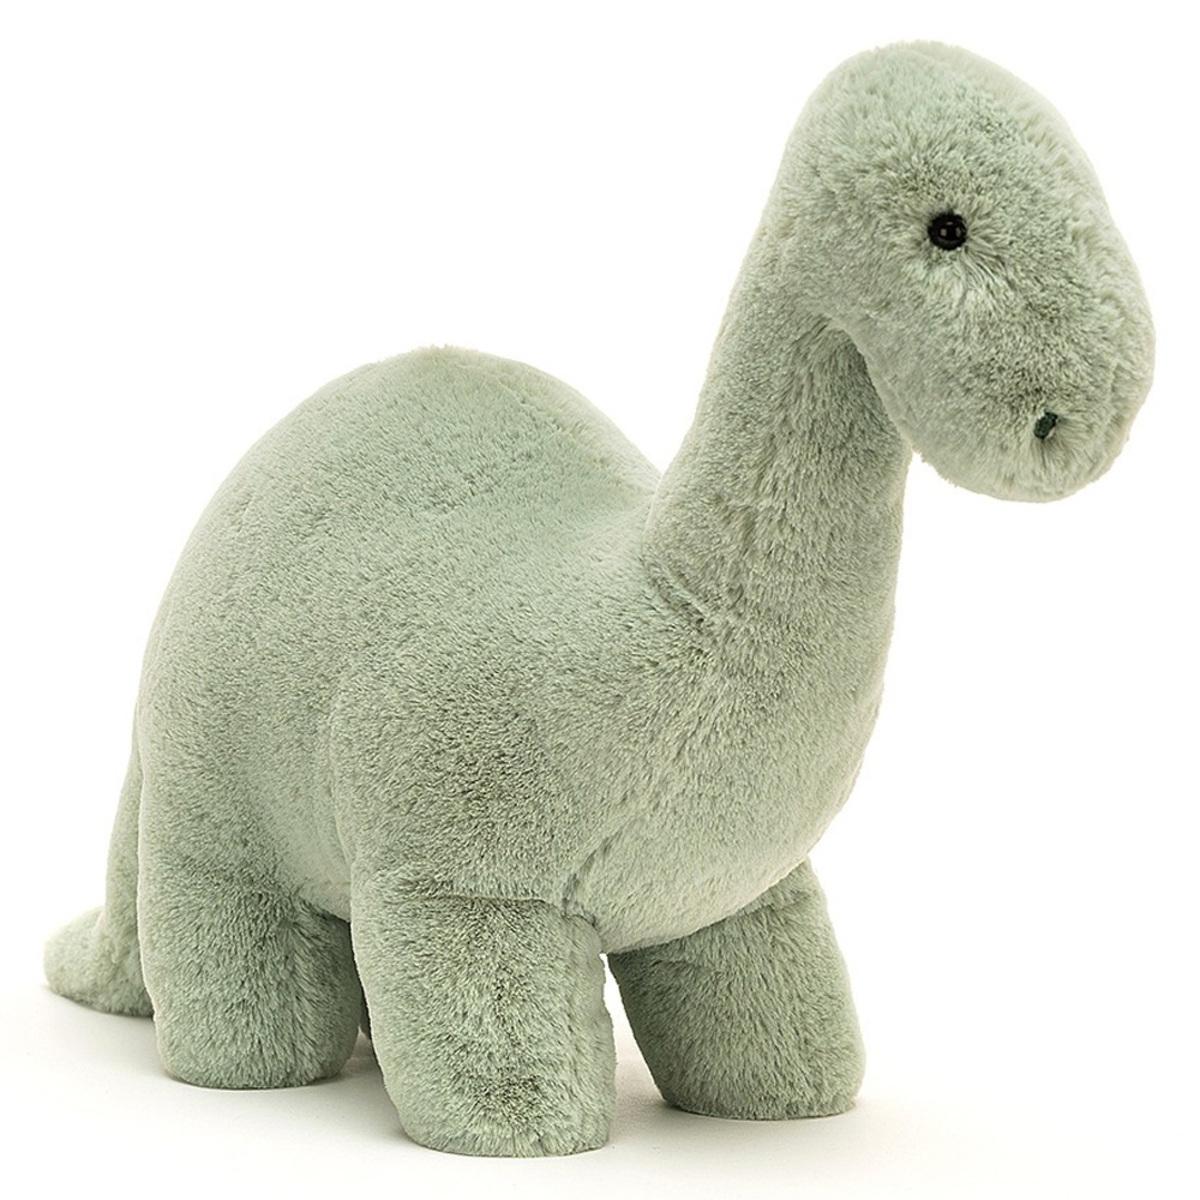 Peluche Fossilly Brontosaurus - Medium Peluche Brontosaure 26 cm